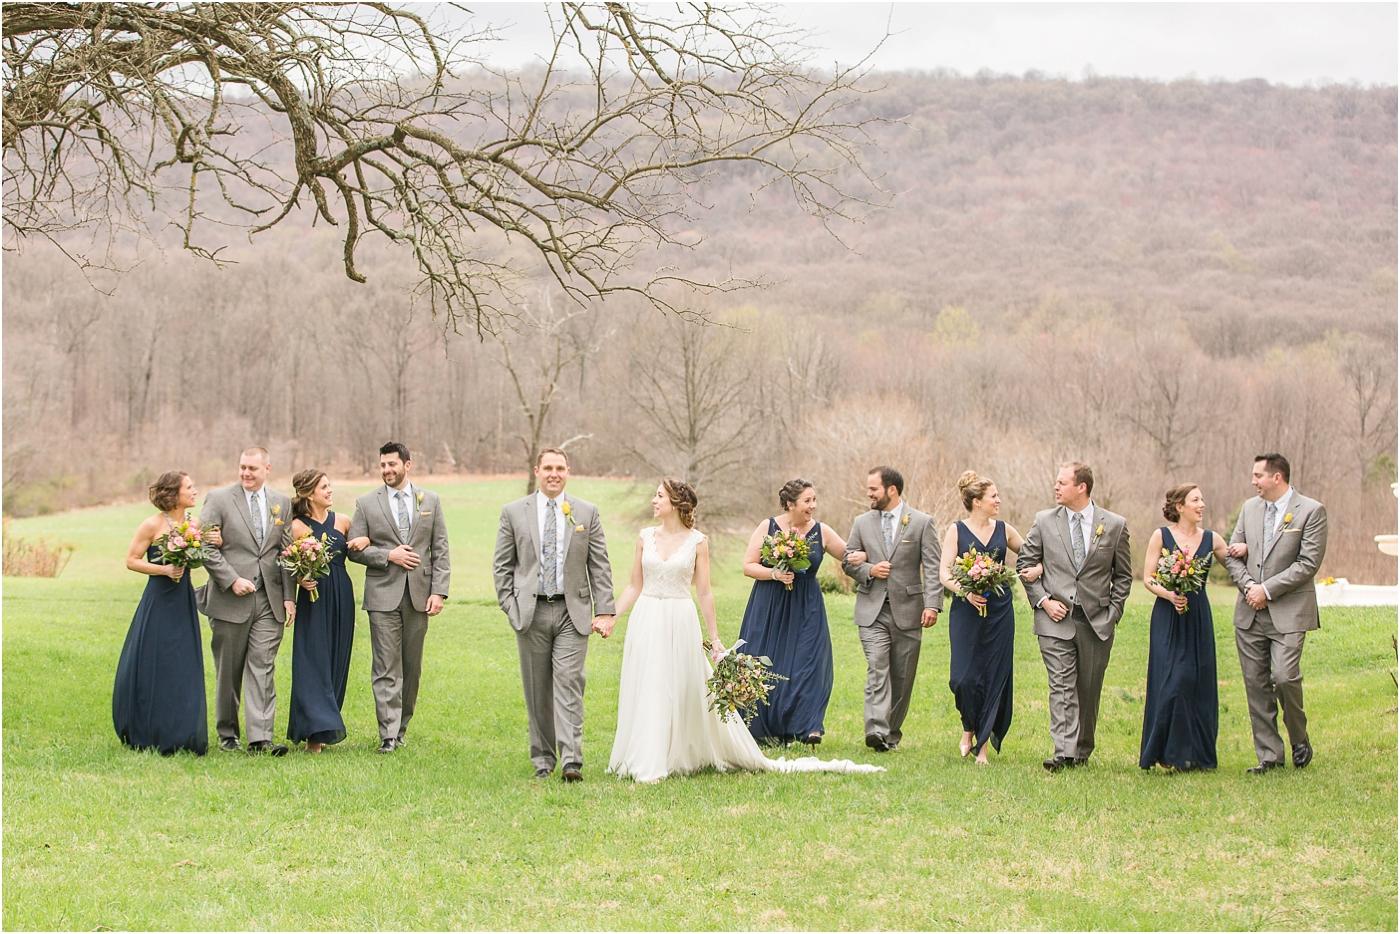 Springfield-manor-winery-wedding-88.jpg